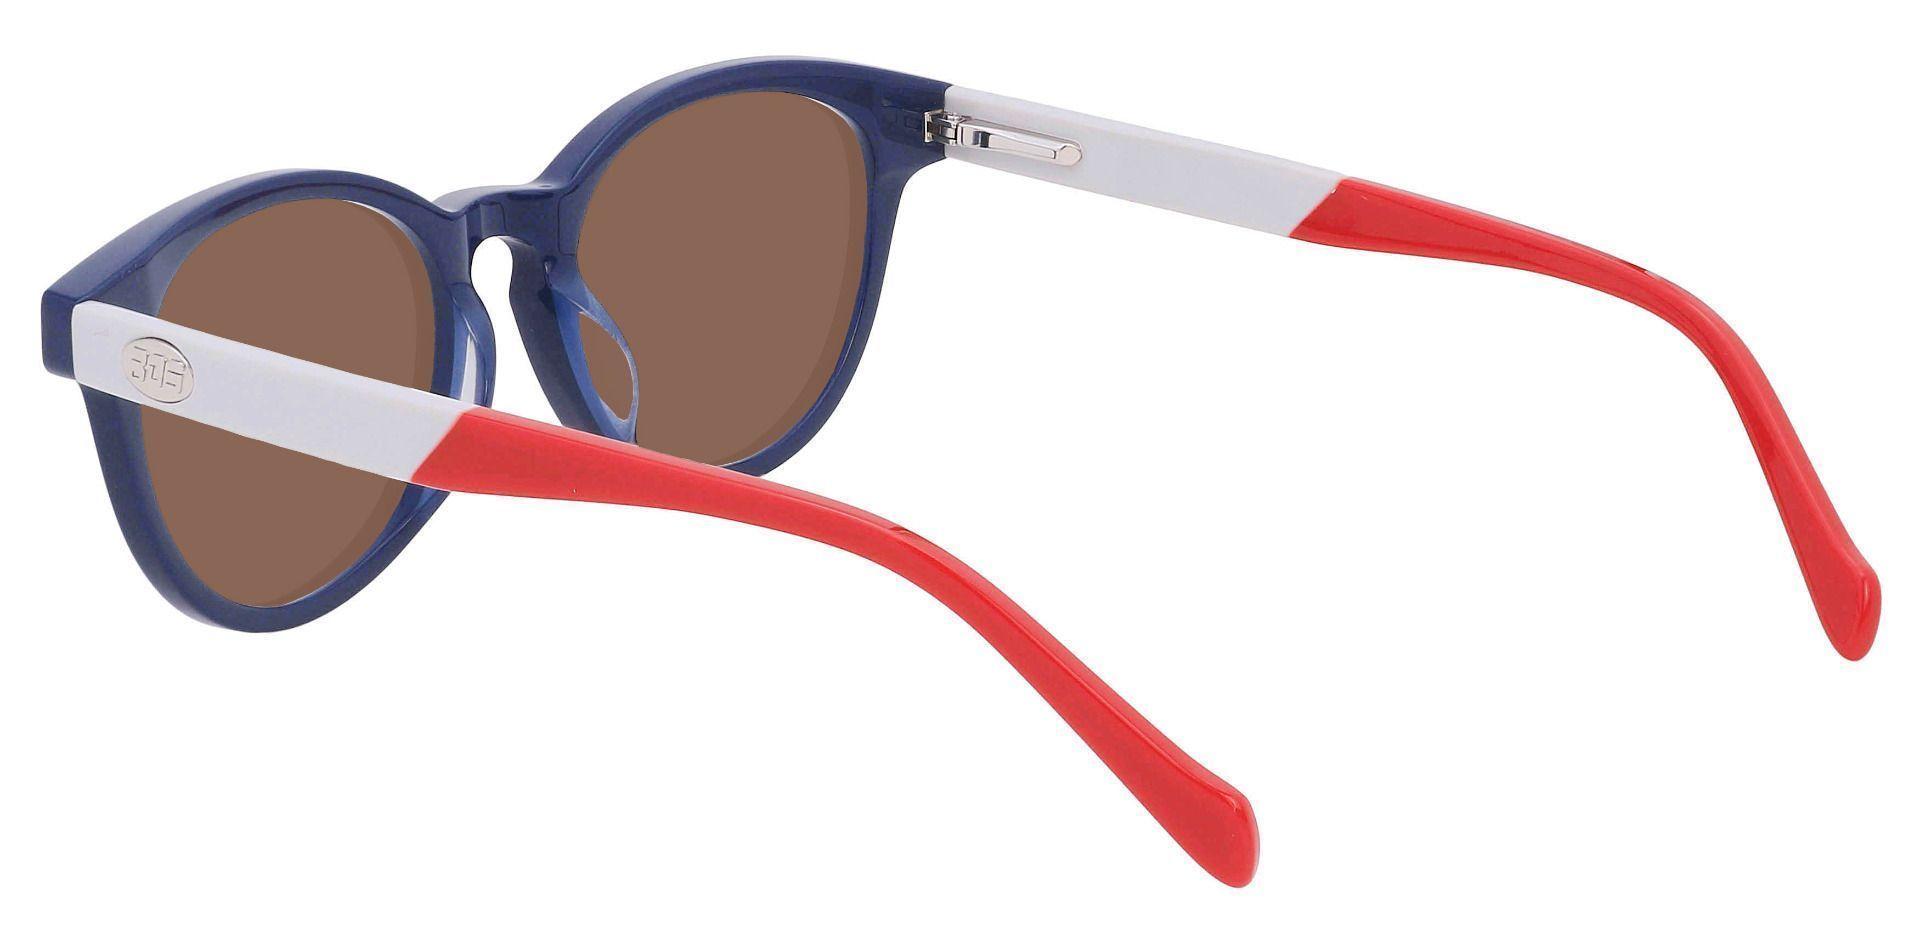 Revere Oval Reading Sunglasses - Blue Frame With Brown Lenses